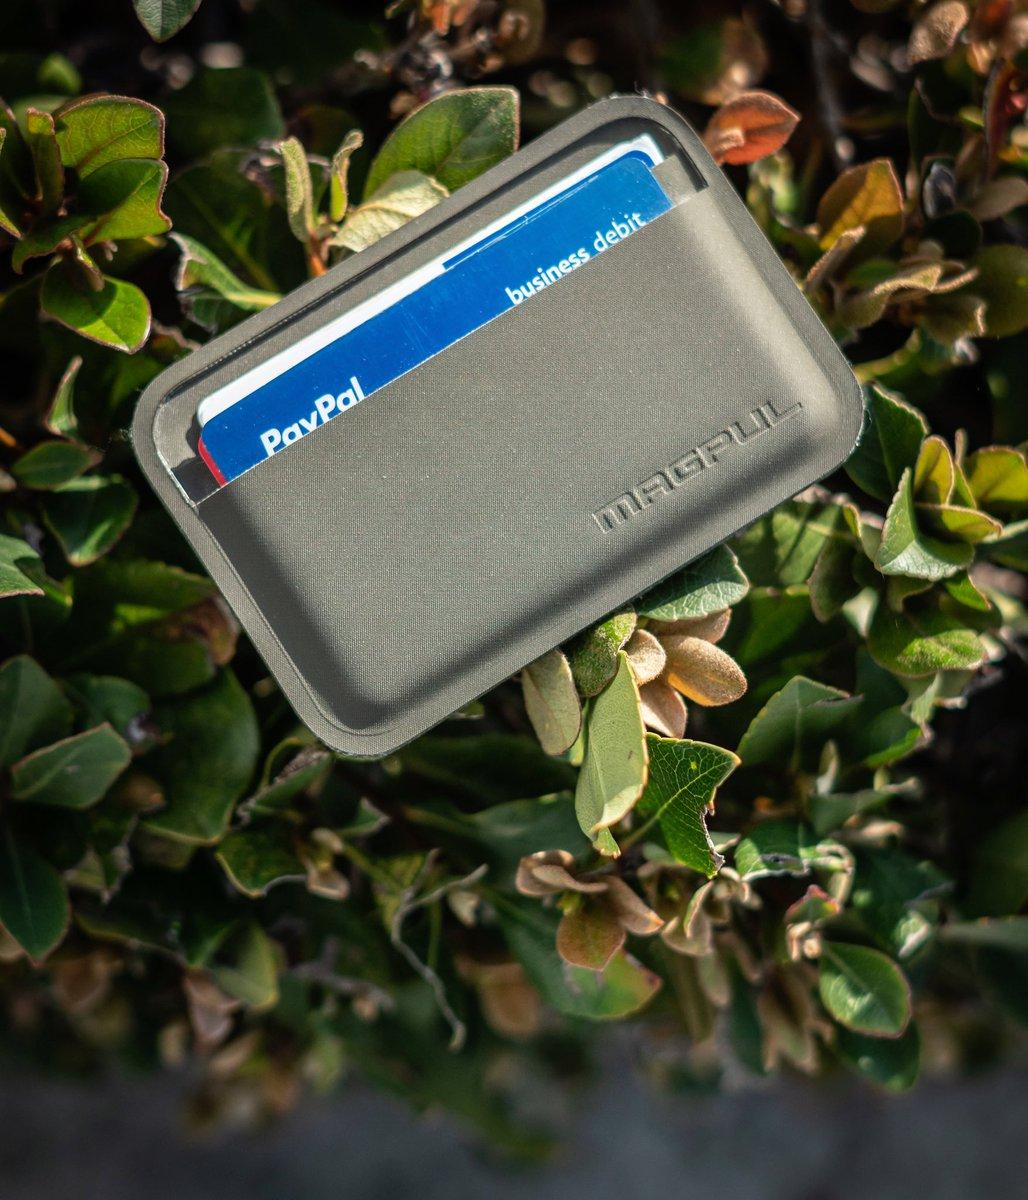 Just the Essentials!  The Magpul Daka Wallet! Perfect EDC  - #EDCCommunity #EDCOfInstagram #HandDump #PocketDump #EDCDaily #EDCPorn #GearPorn #GearJunkie #DailyCarrypic.twitter.com/CJ6vO3fkwz